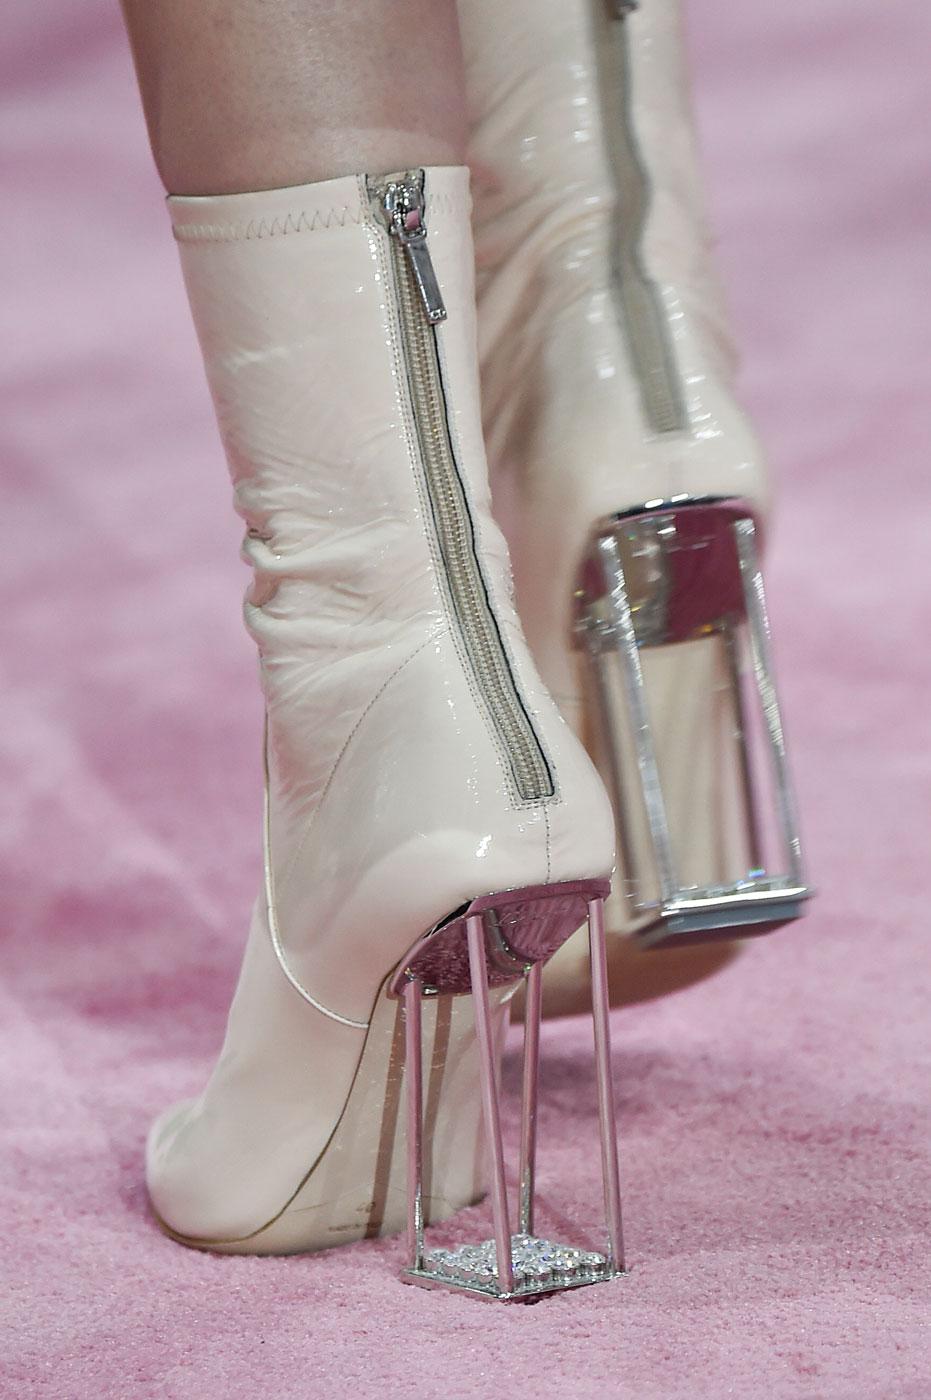 Christian-Dior-fashion-runway-show-close-ups-haute-couture-paris-spring-summer-2015-the-impression-075